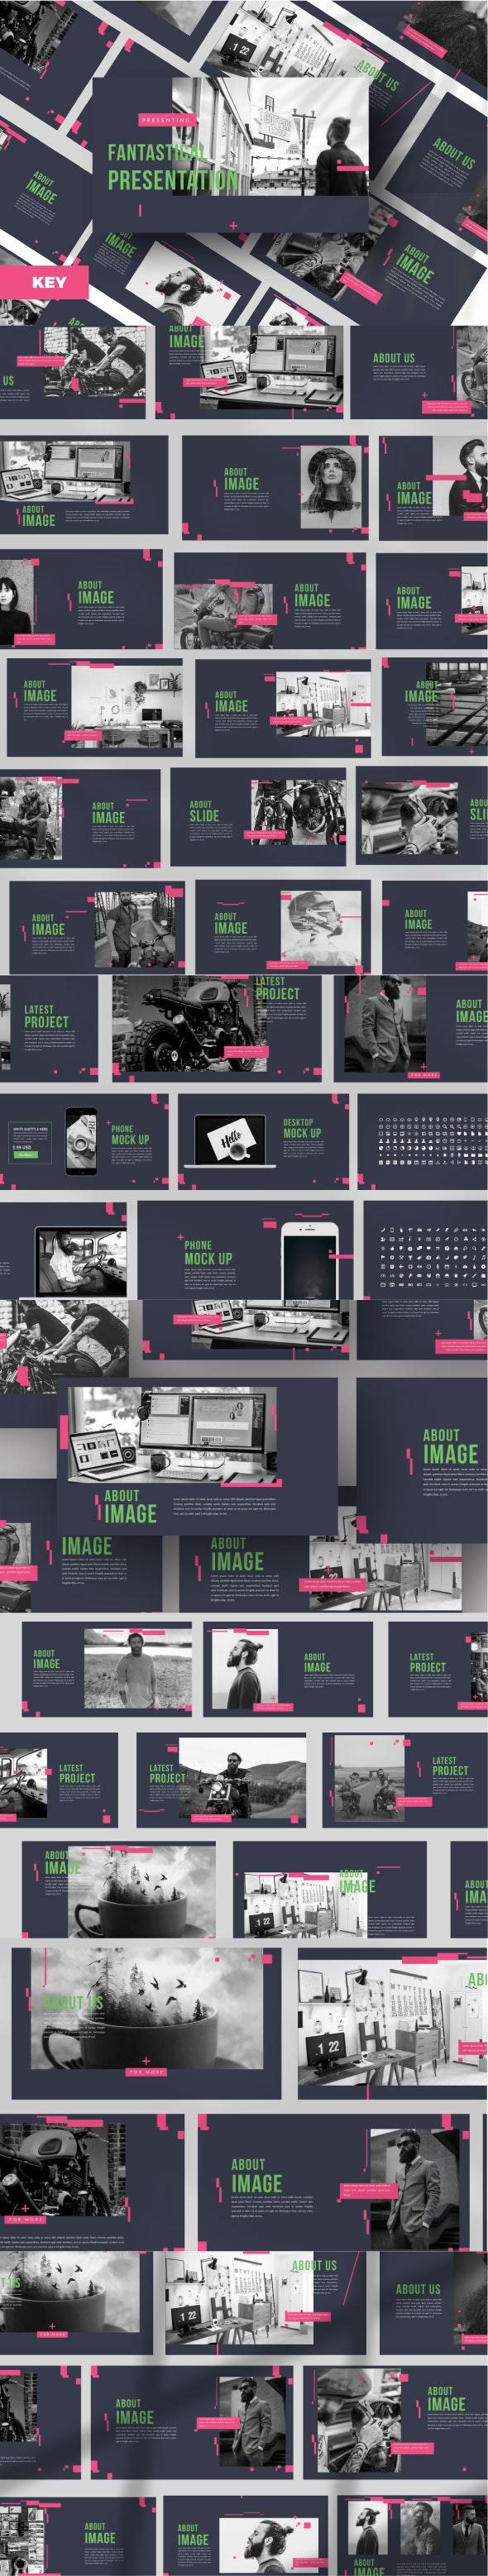 Fantastical Creative Keynote - Creative Keynote Templates